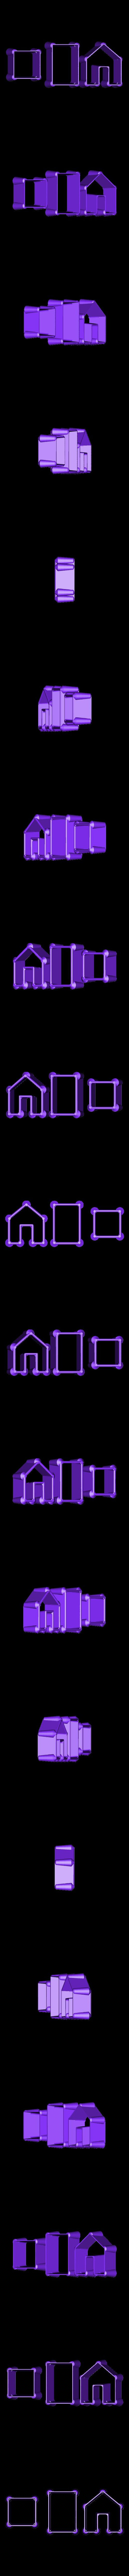 lebkuchenhaus1v2.stl Download free STL file Gingerbread house cookie cutter • 3D print object, Henry_Millenium